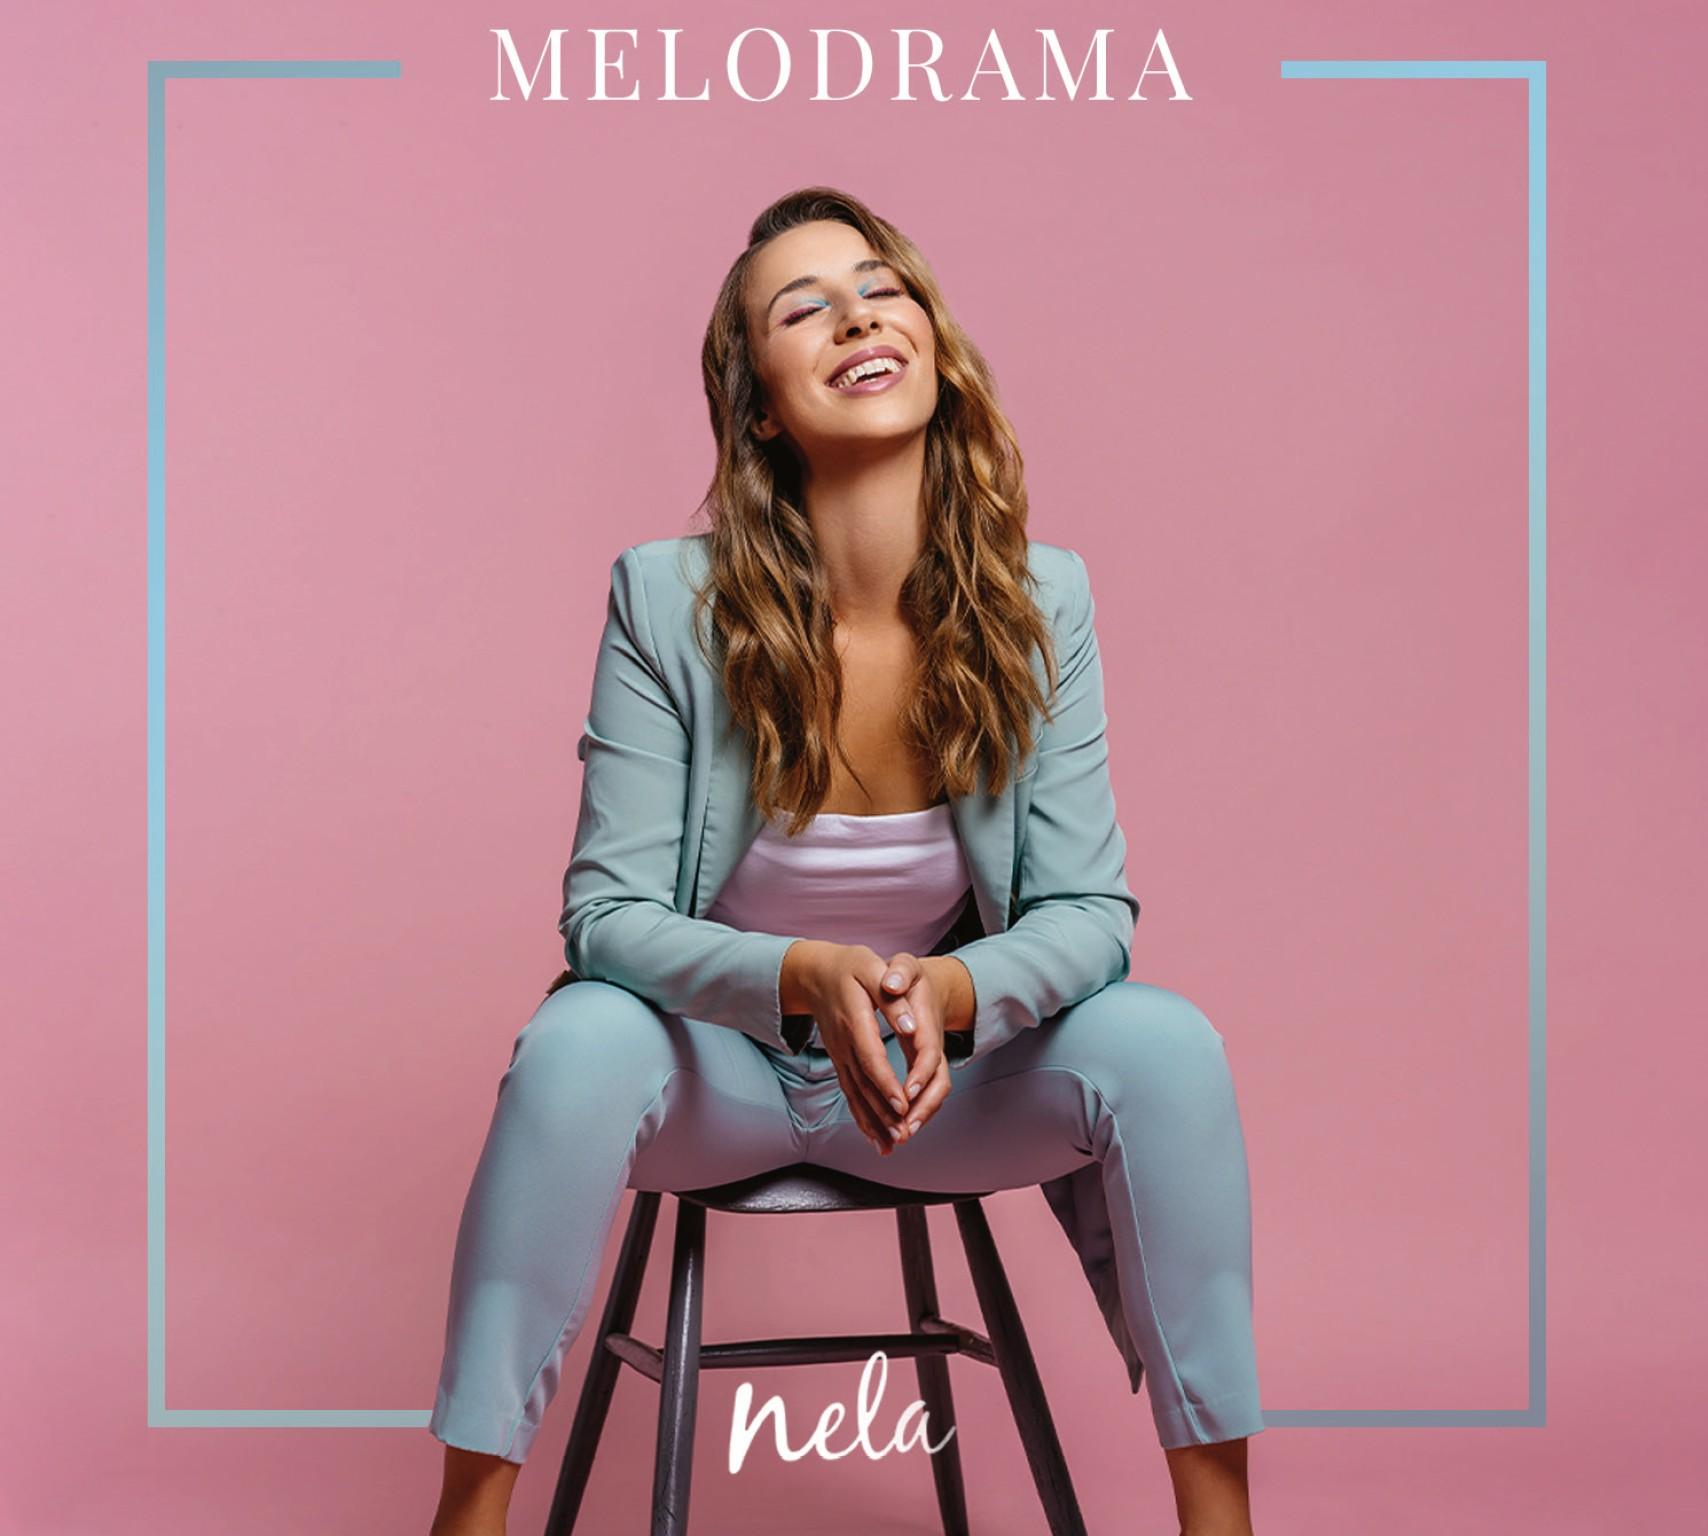 """Melodrama"", prvi album Nele, ekskluzivno na streaming platformama – krenule prednarudžbe albuma"